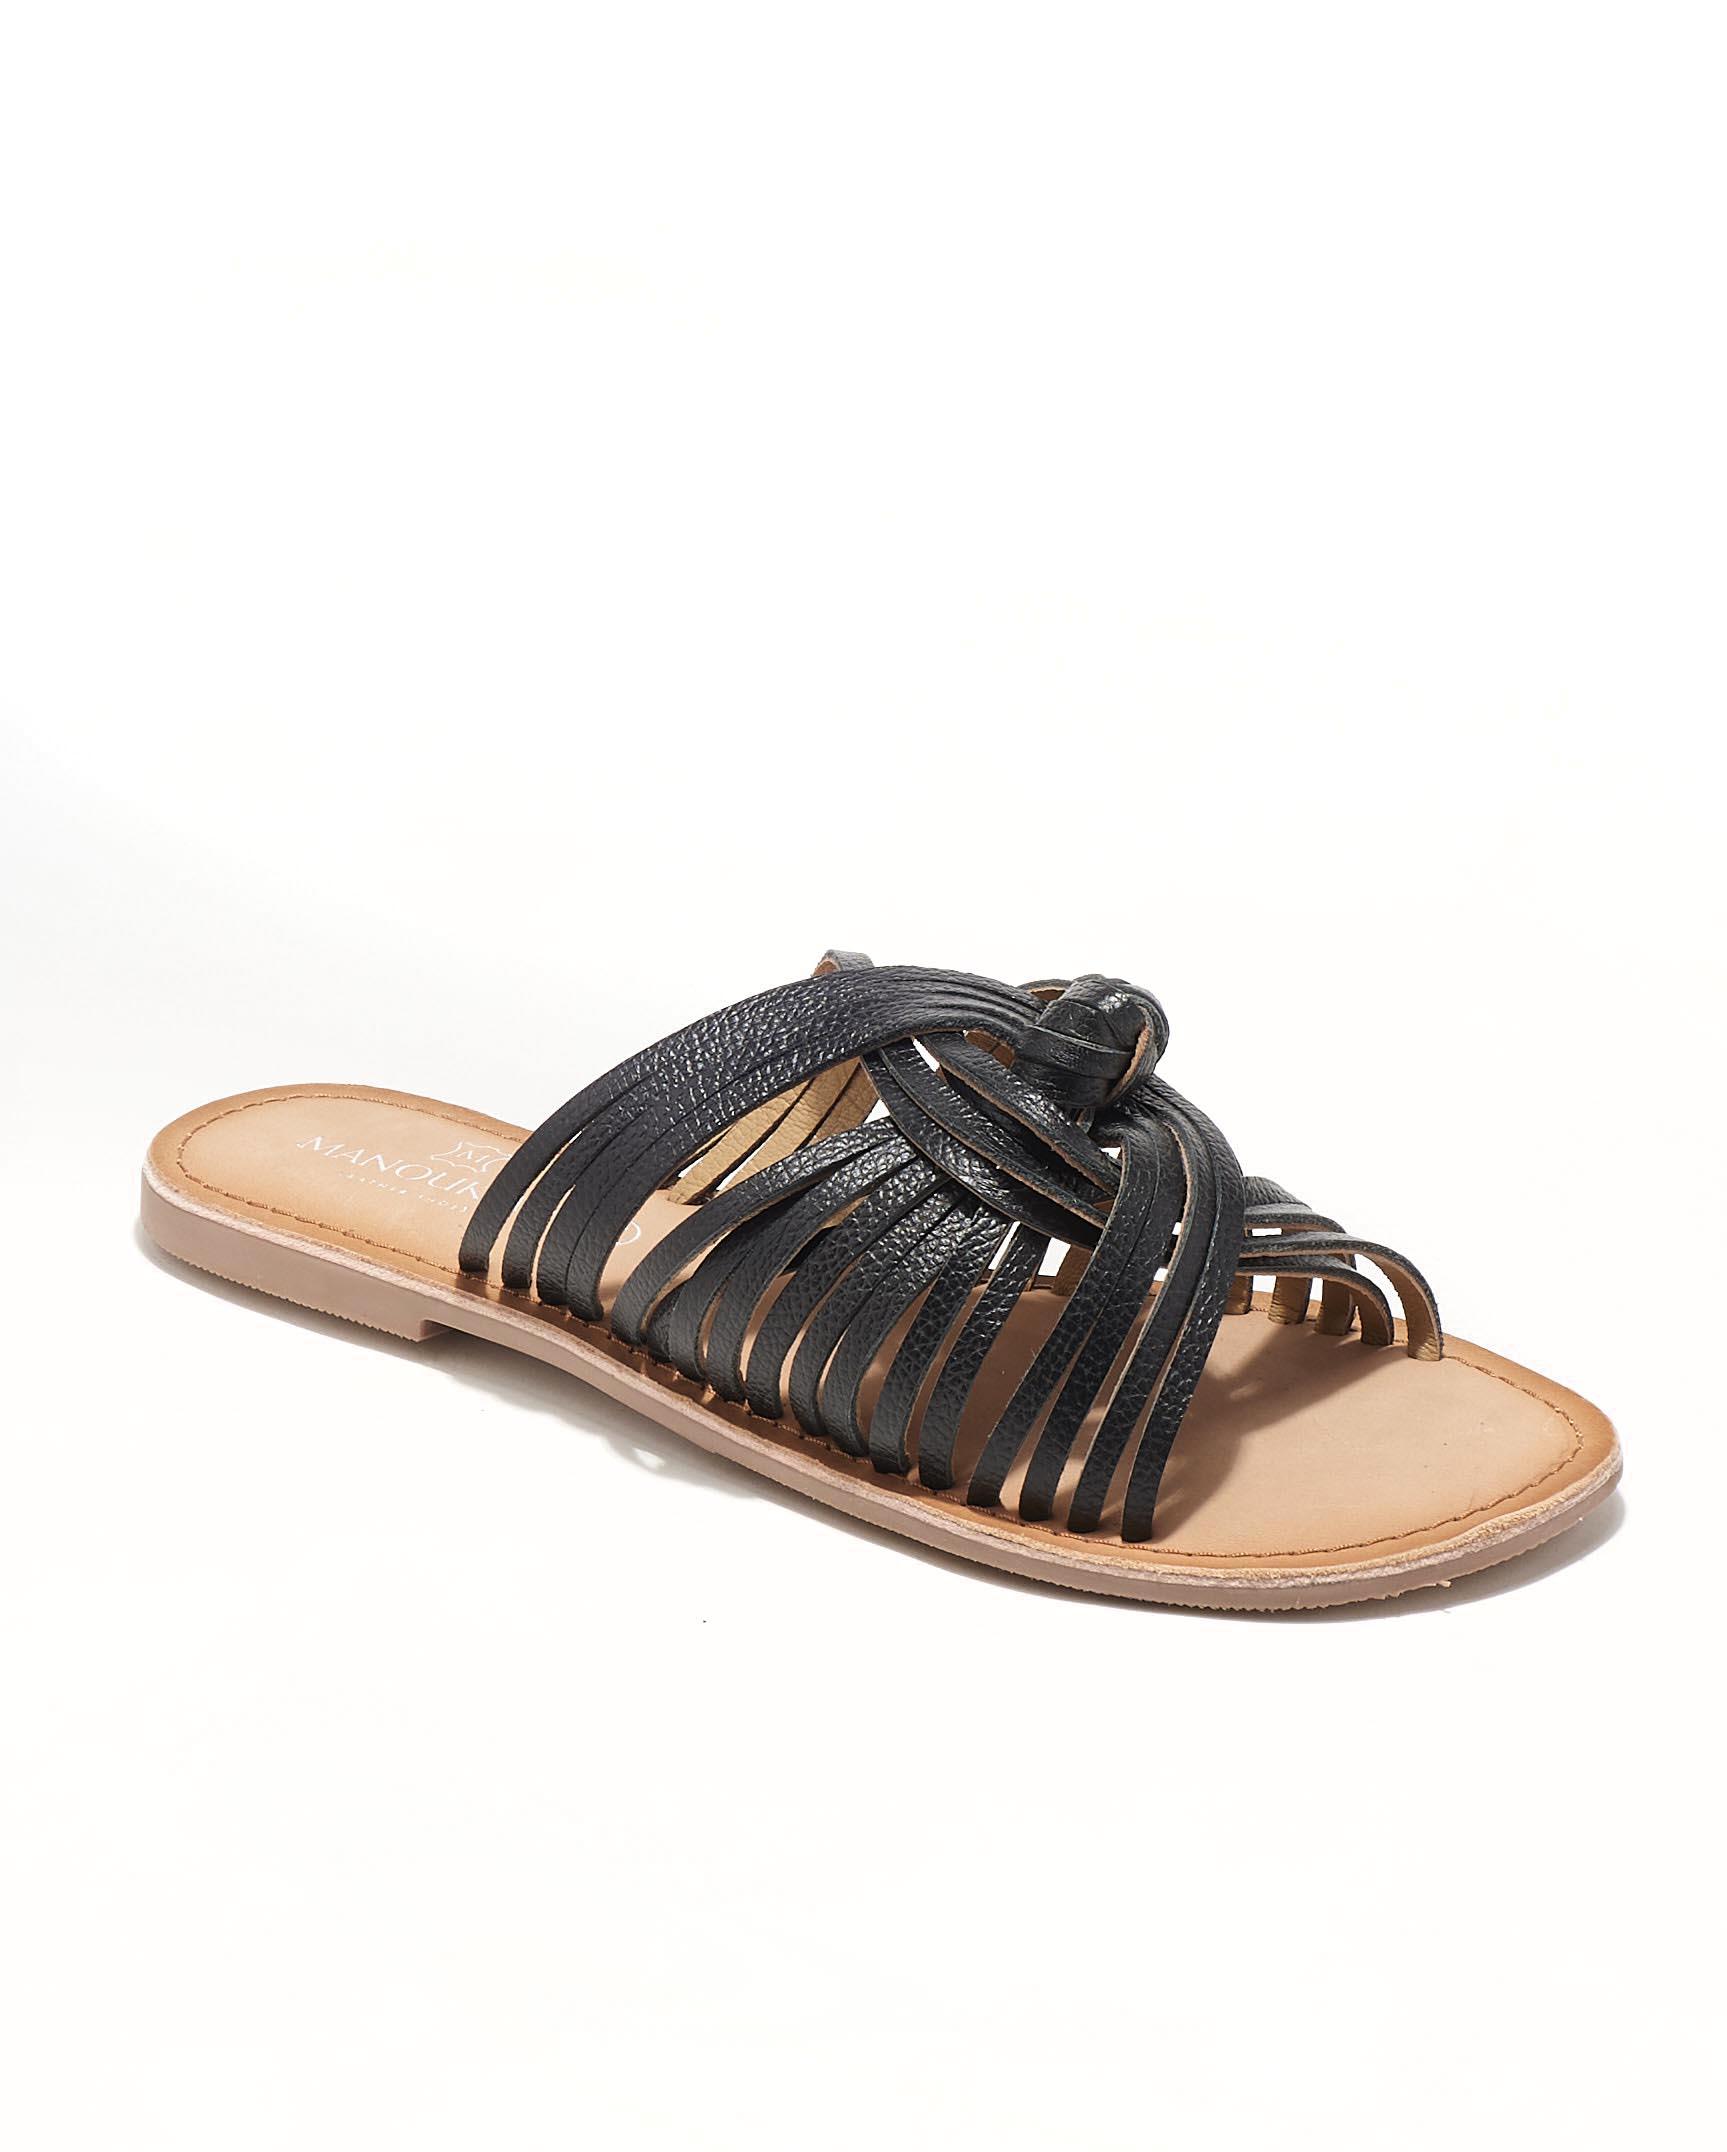 Mules Femme - Mule Plate Noir Jina - Kassidy